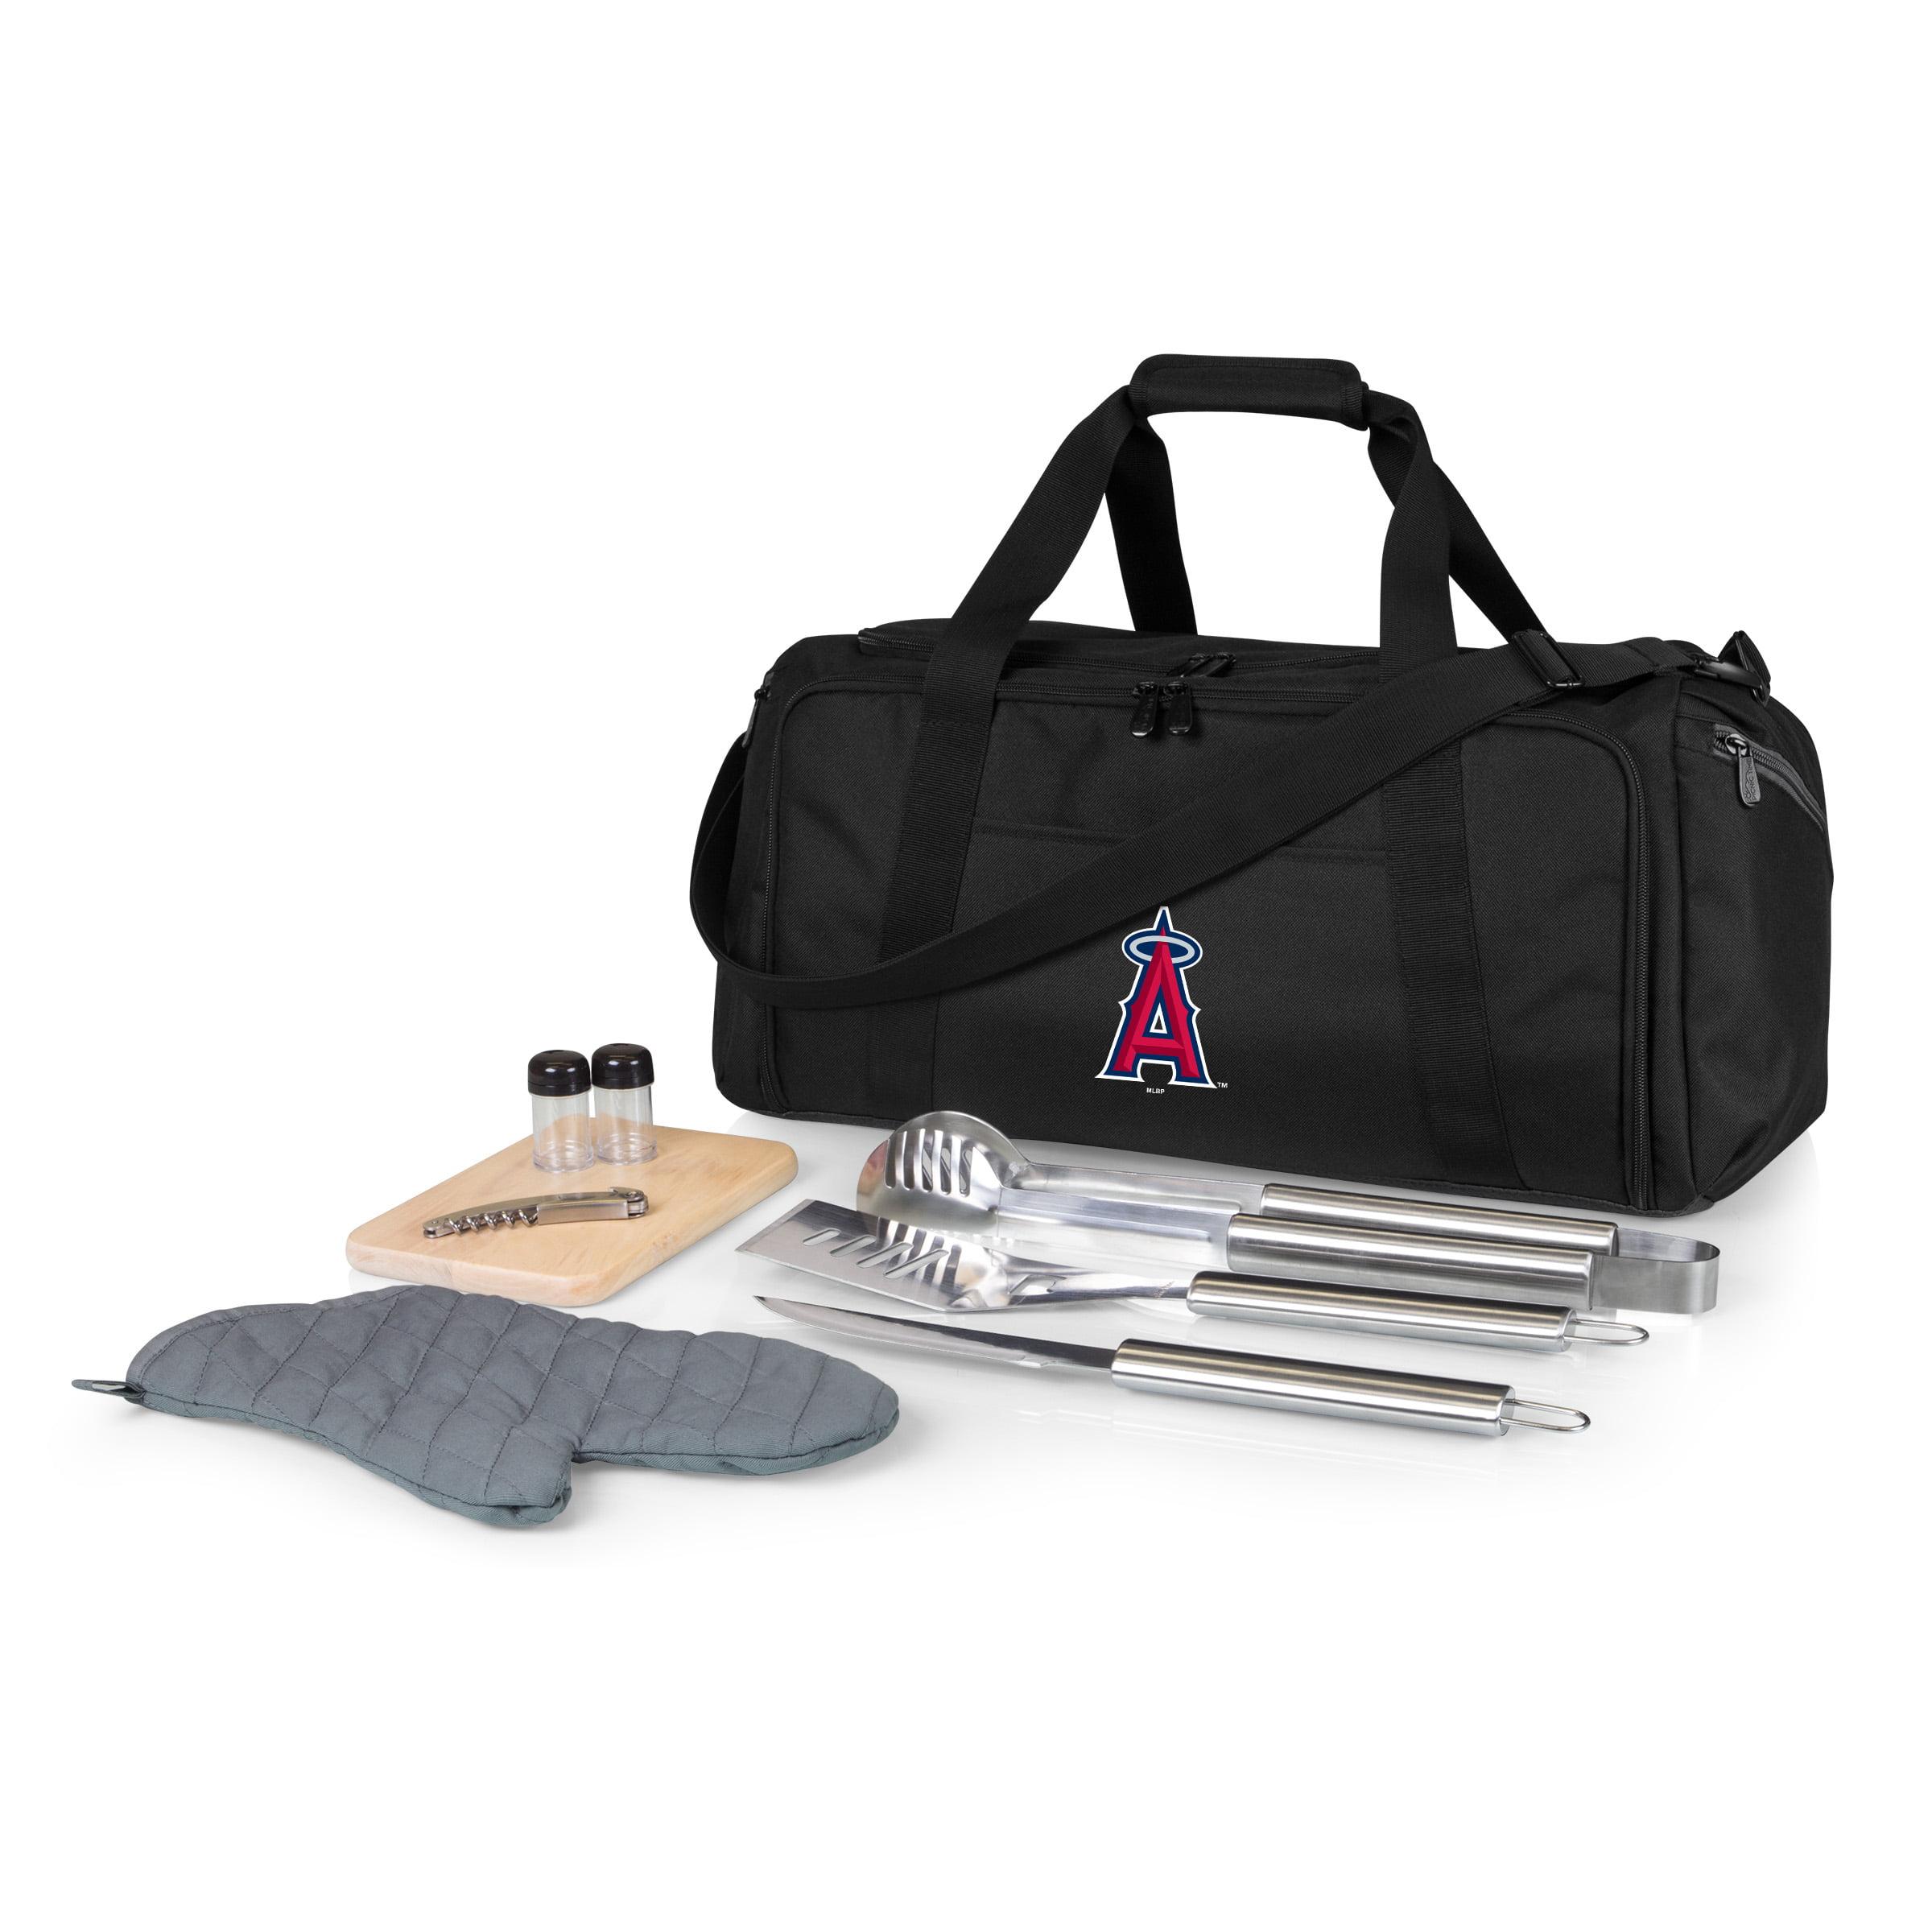 Los Angeles Angels BBQ Kit Cooler - Black - No Size